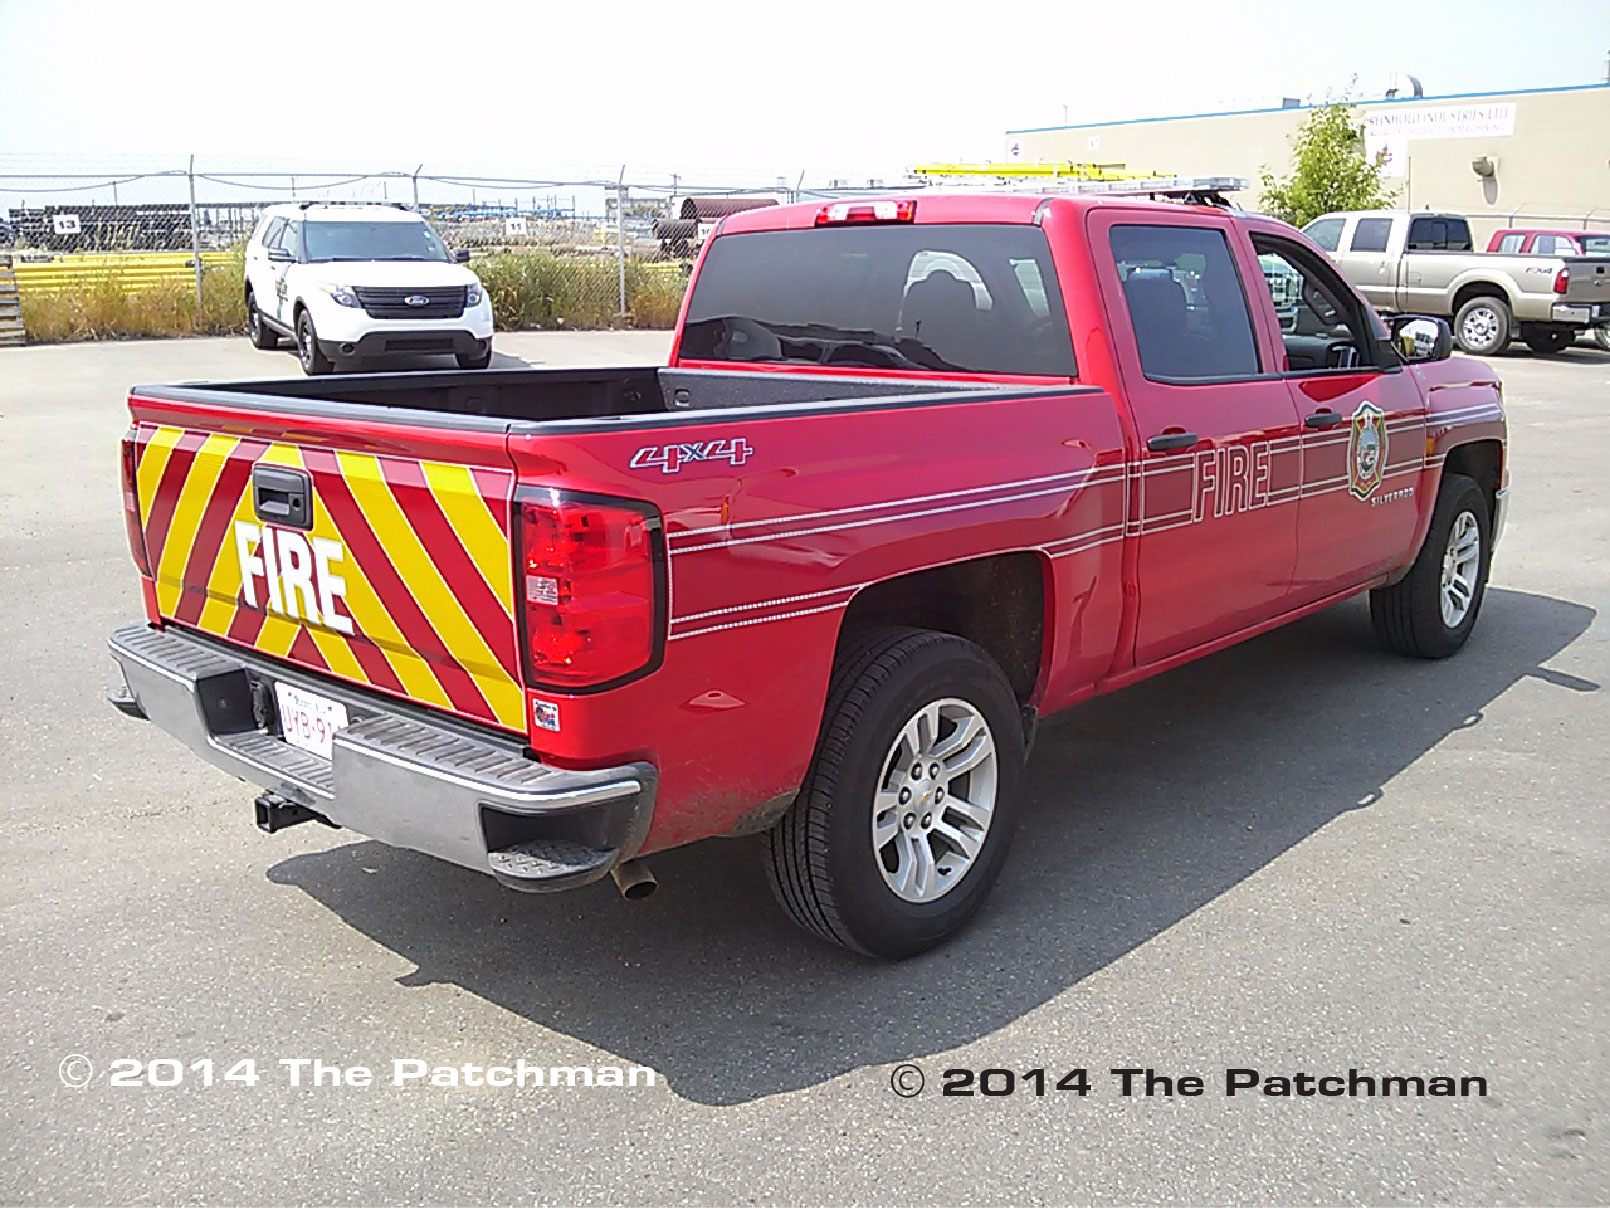 Bonnyville Regional Fire - Command 1